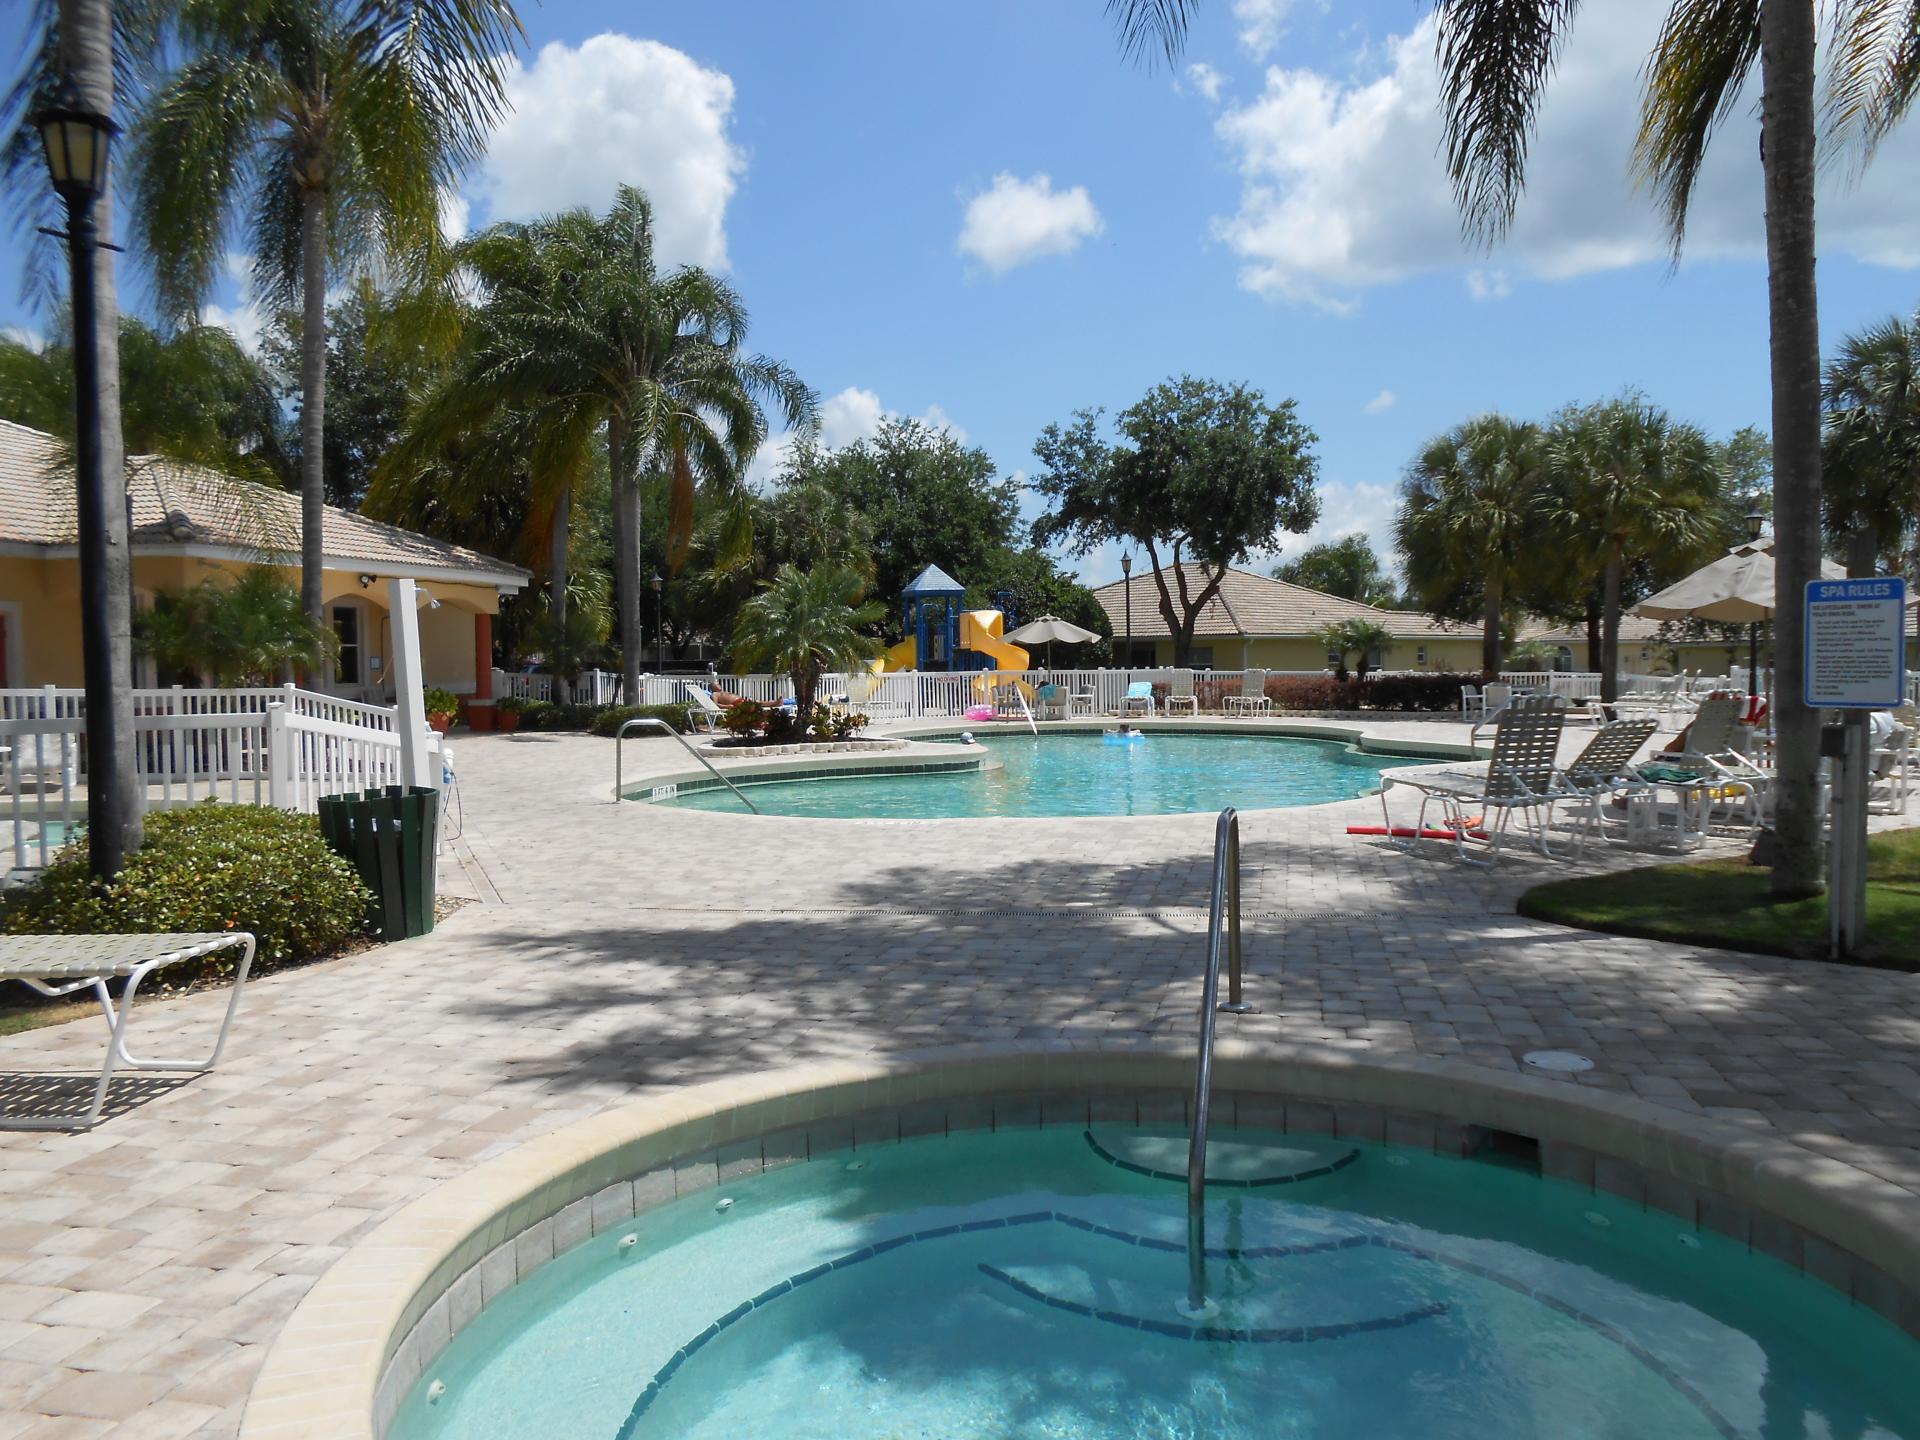 Main Pool area at Club House